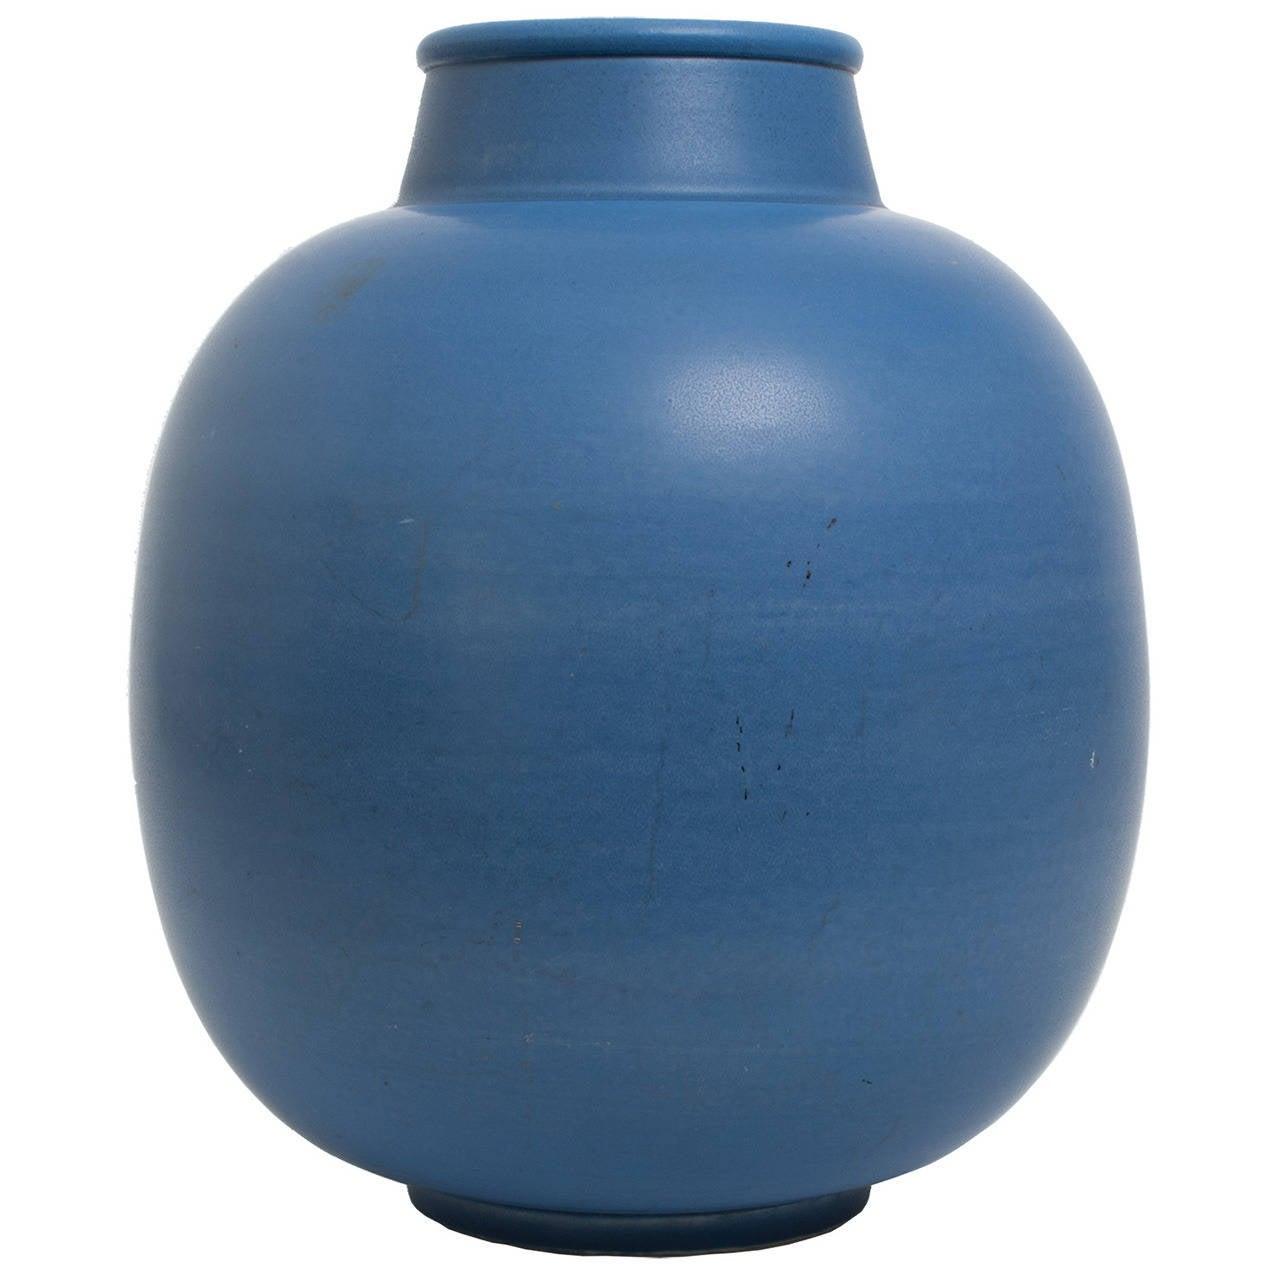 Swedish Art Deco Ceramic Blue Vase by Gertrud Lonegren